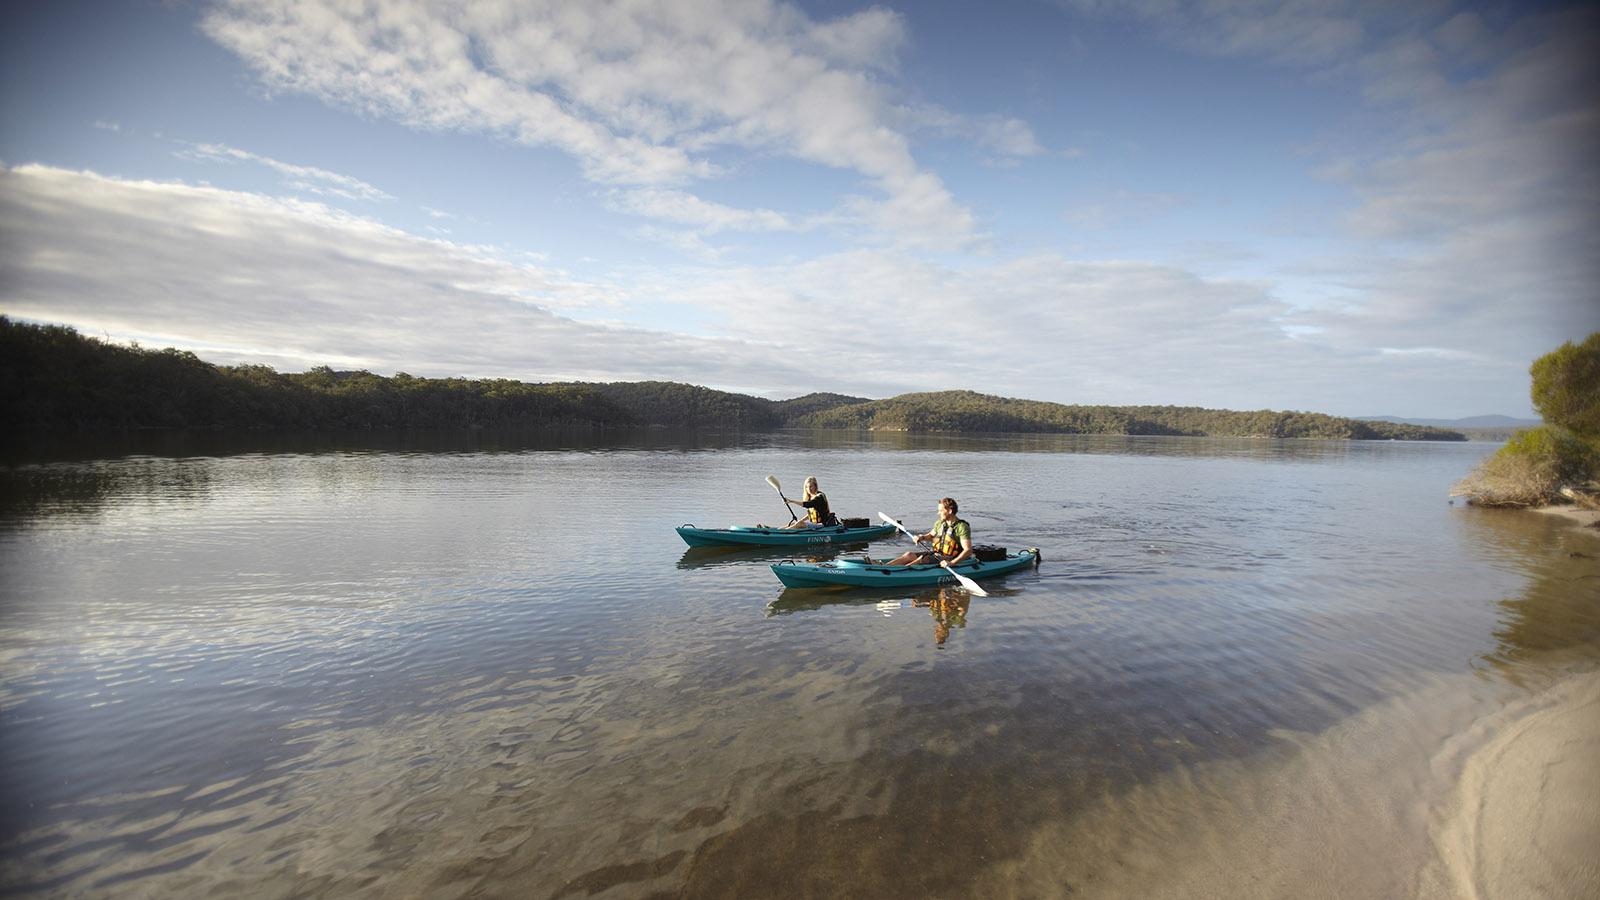 Kayaking at Gippsland Lakes, Gippsland, Victoria, Australia